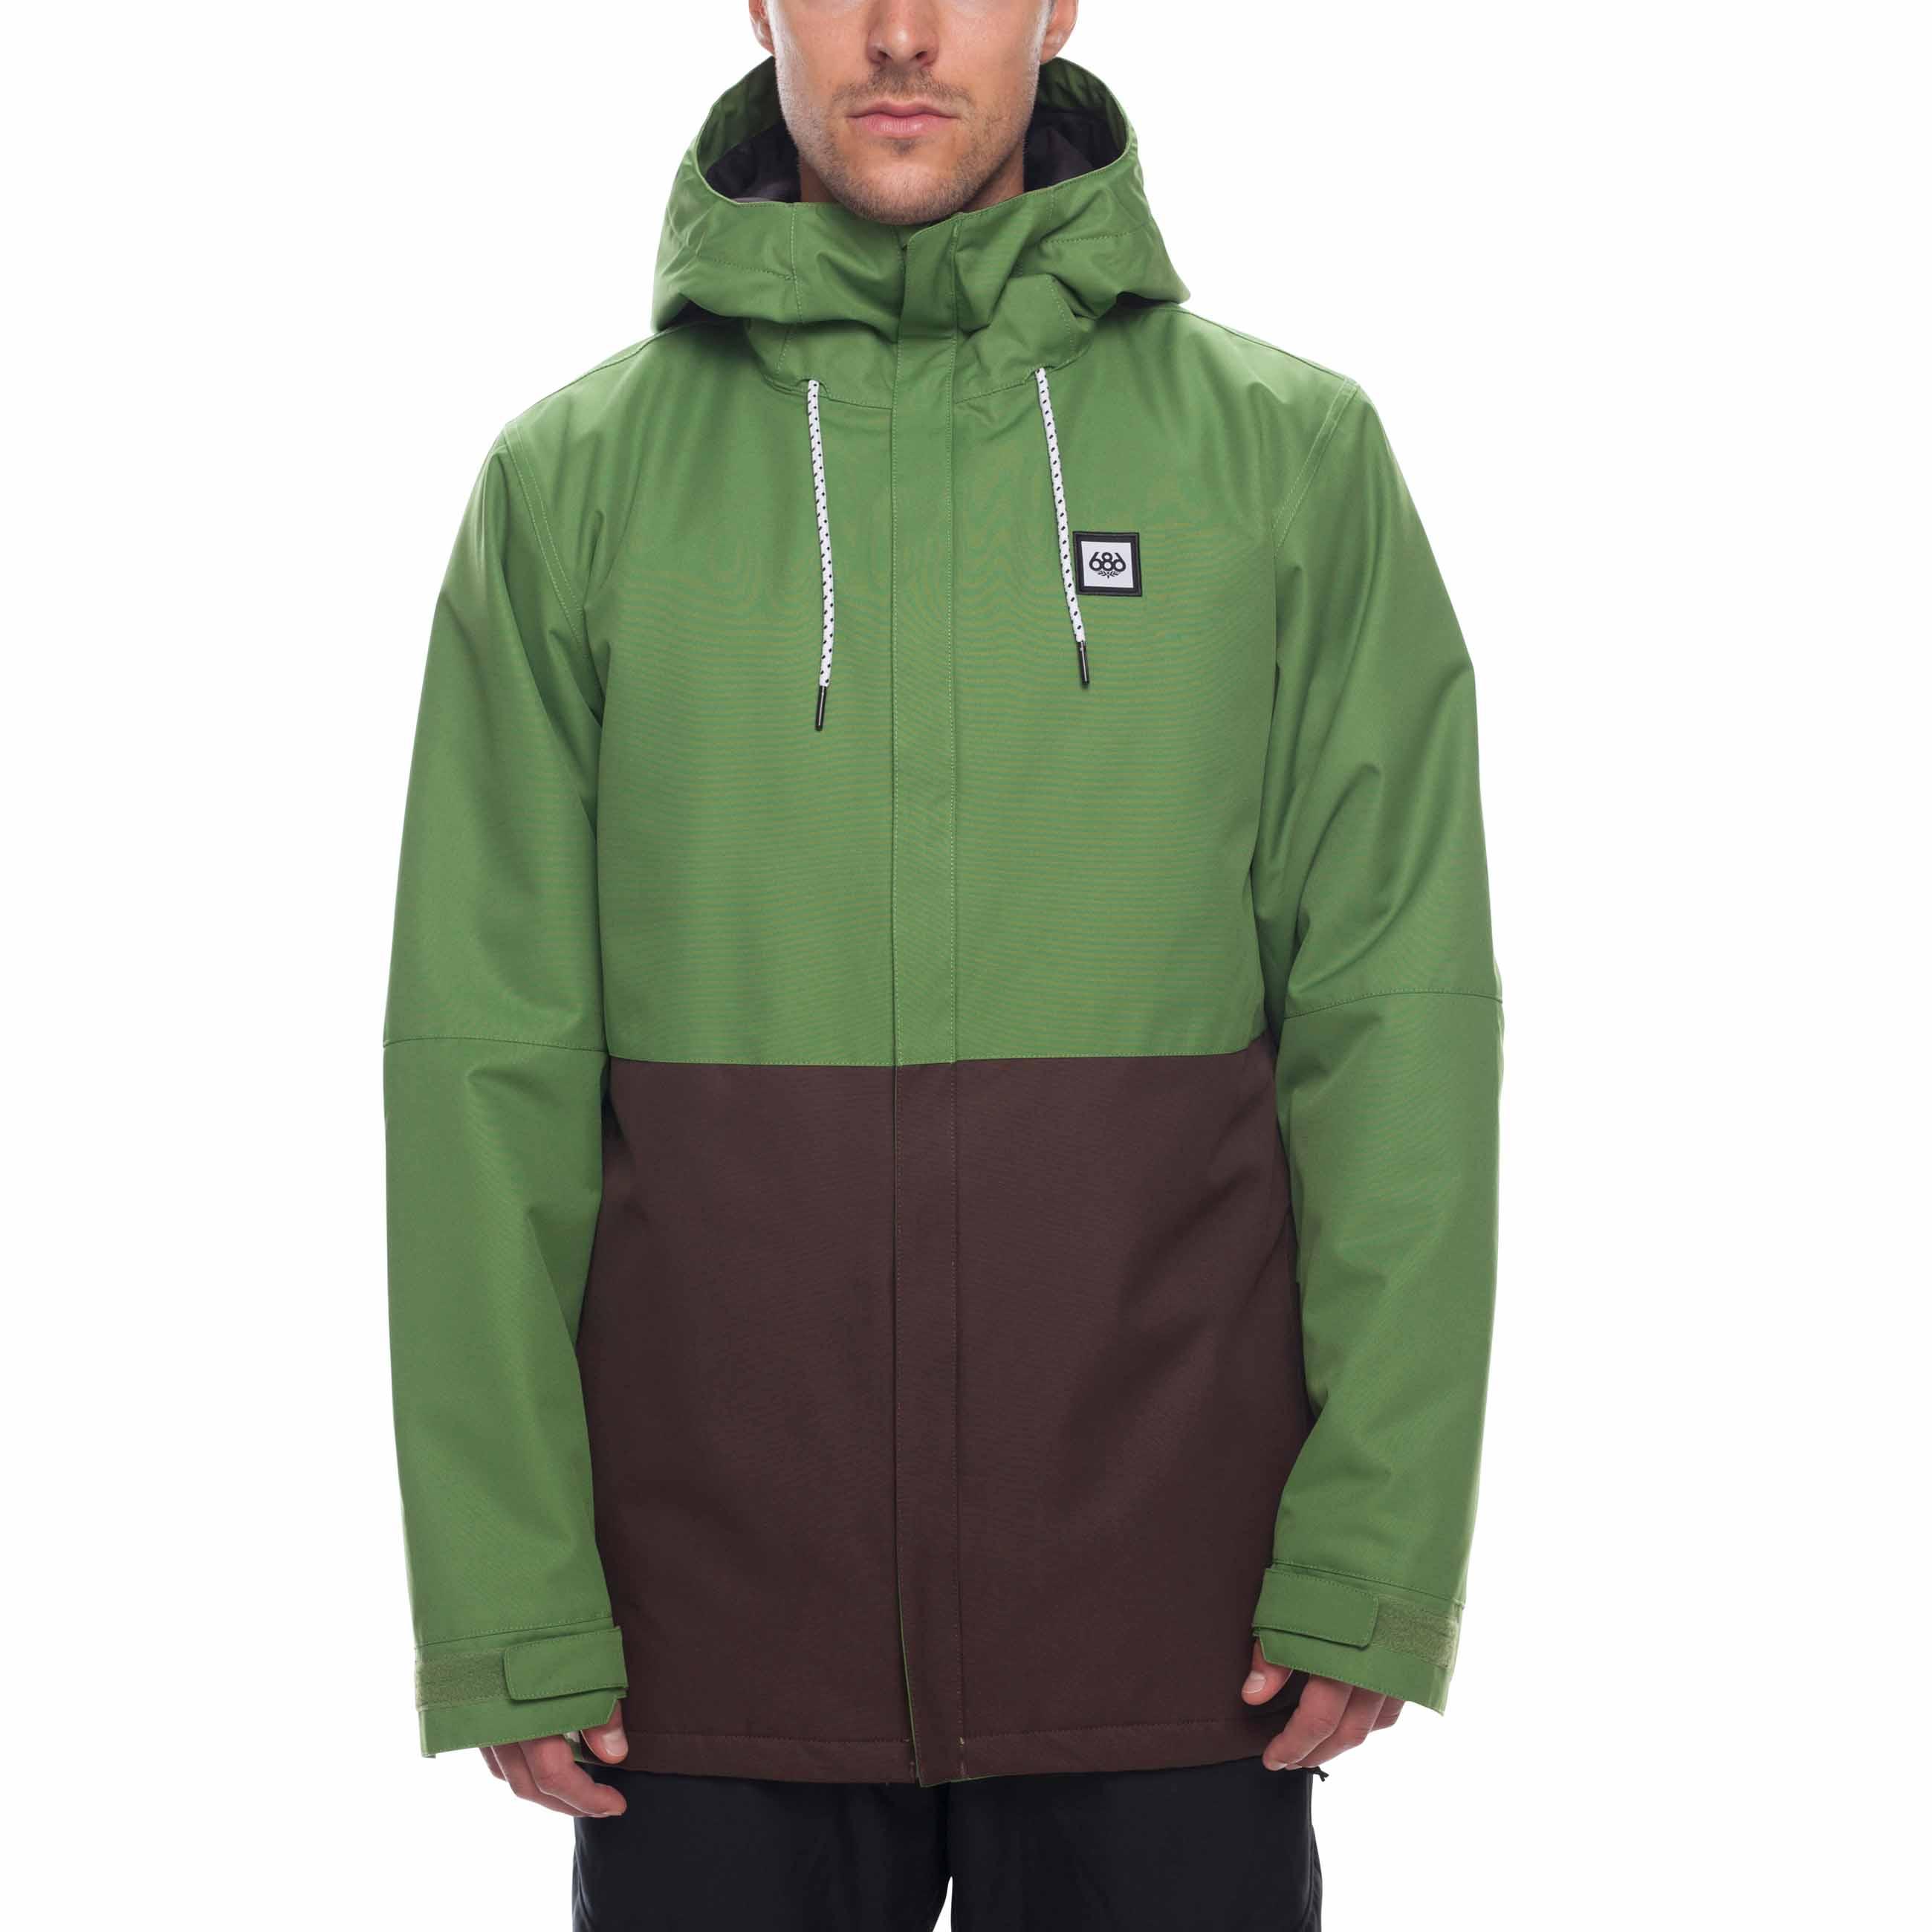 Waterproof Ski//Snowboard Winter Coat 686 Mens Foundation Insulated Jacket